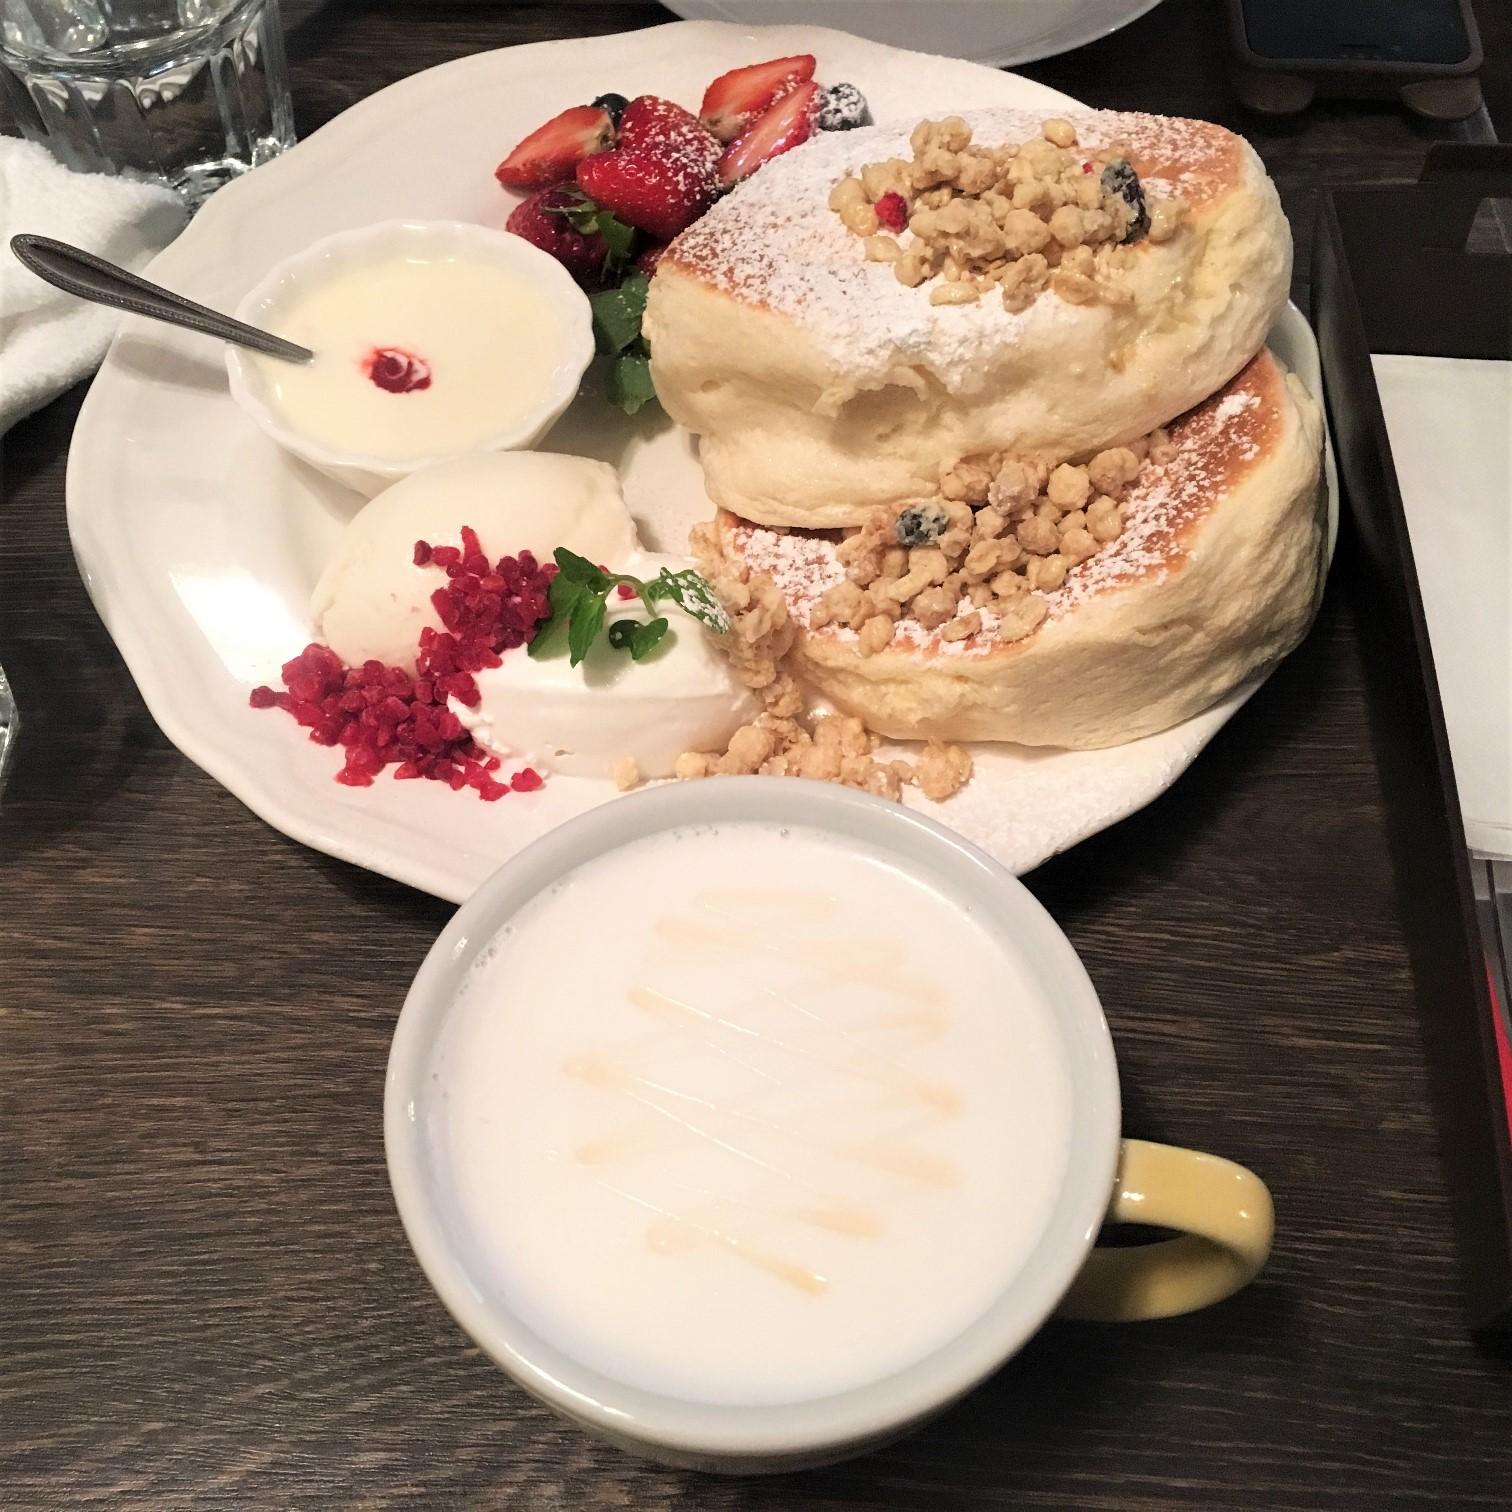 Cafe del SOL 福岡鬆餅 福岡美食 福岡 甜點